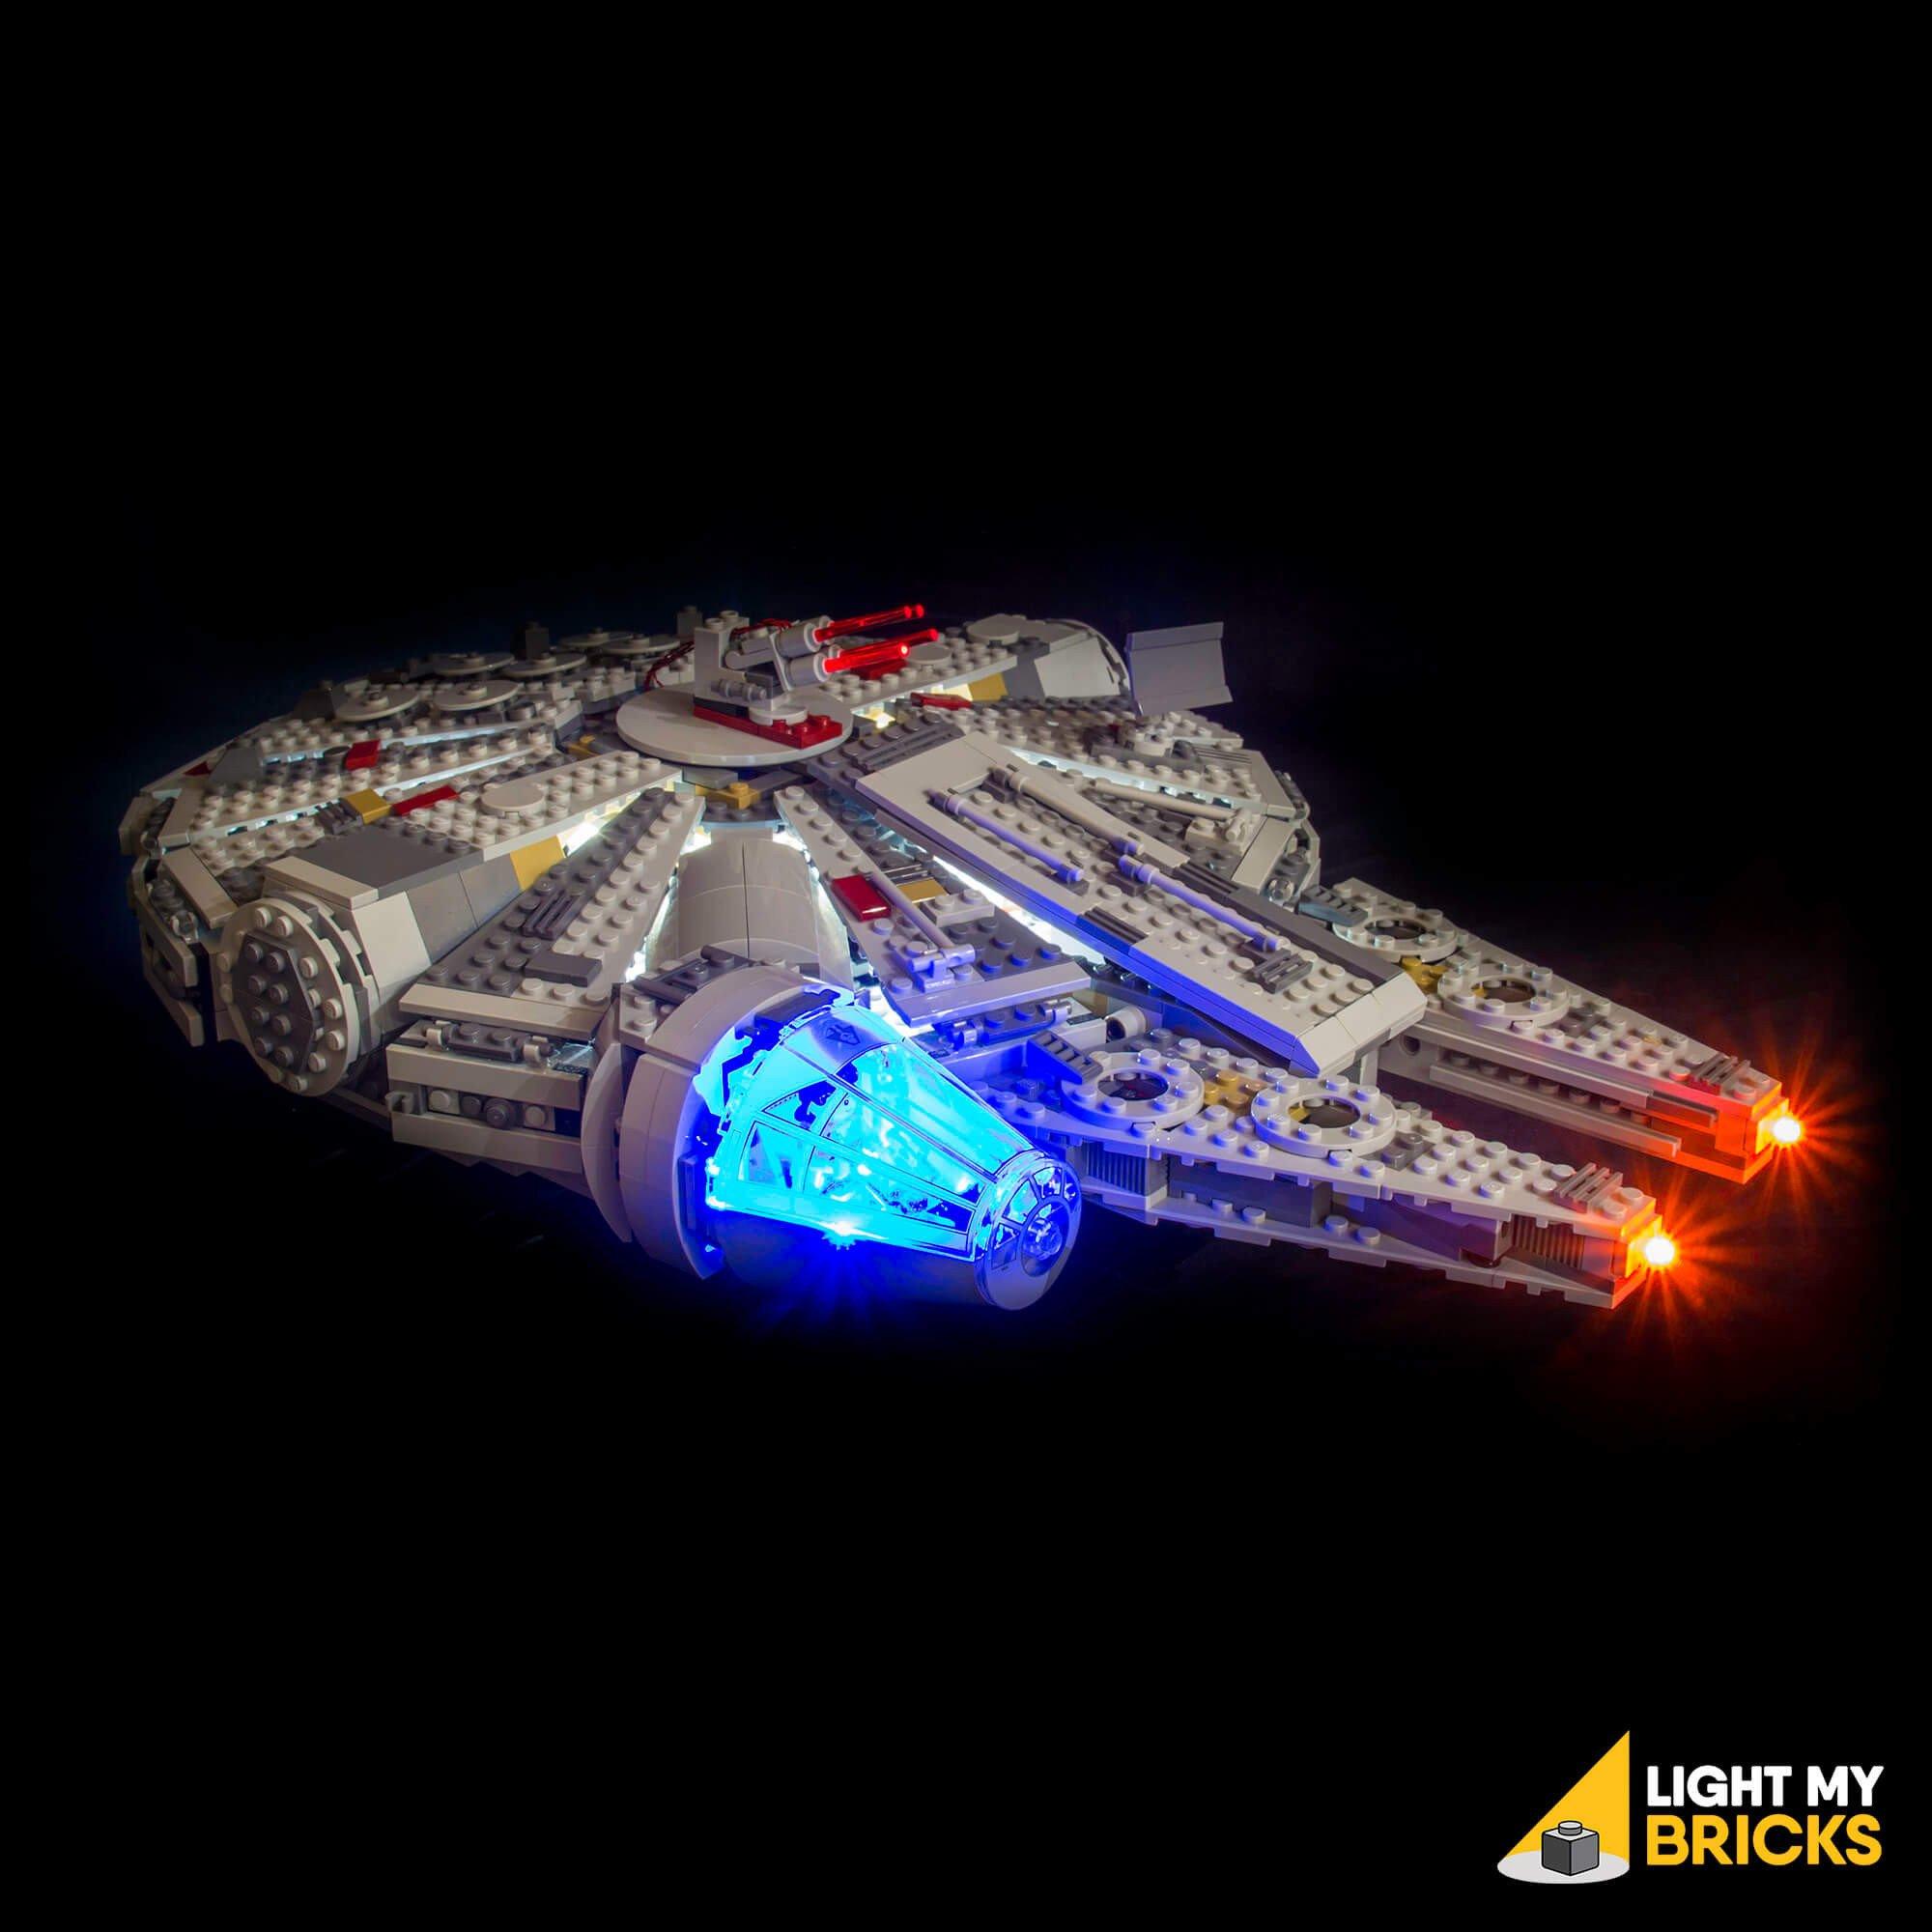 LEGO Millennium Falcon 75105 Light My Bricks